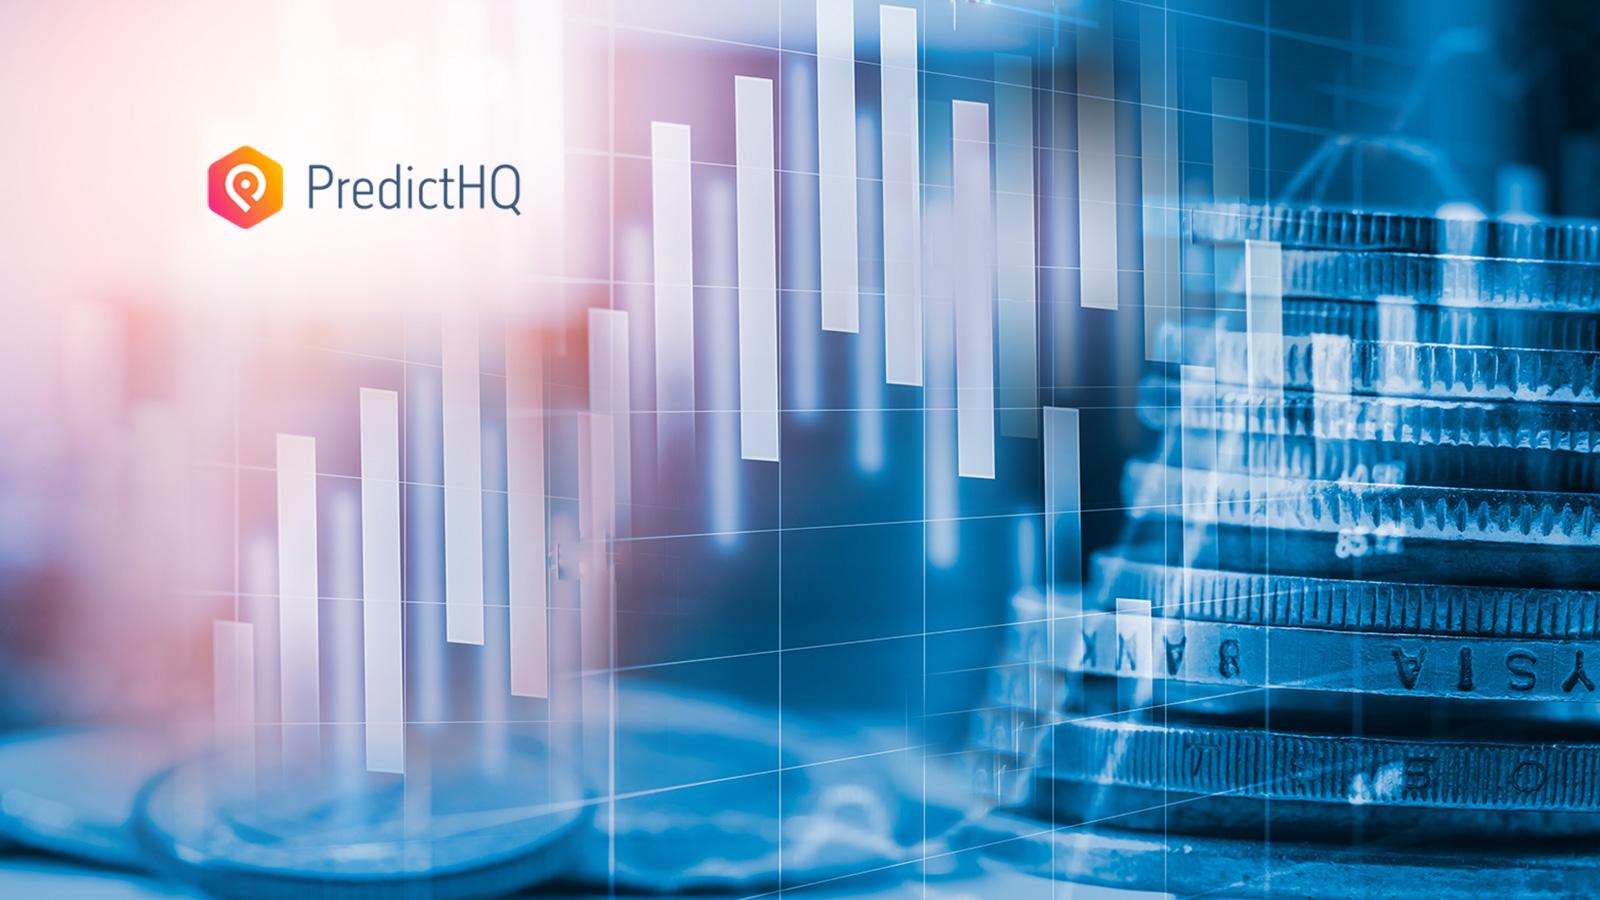 "PredictHQ通过机器学习,帮助航空公司自动预测全球性事件"""